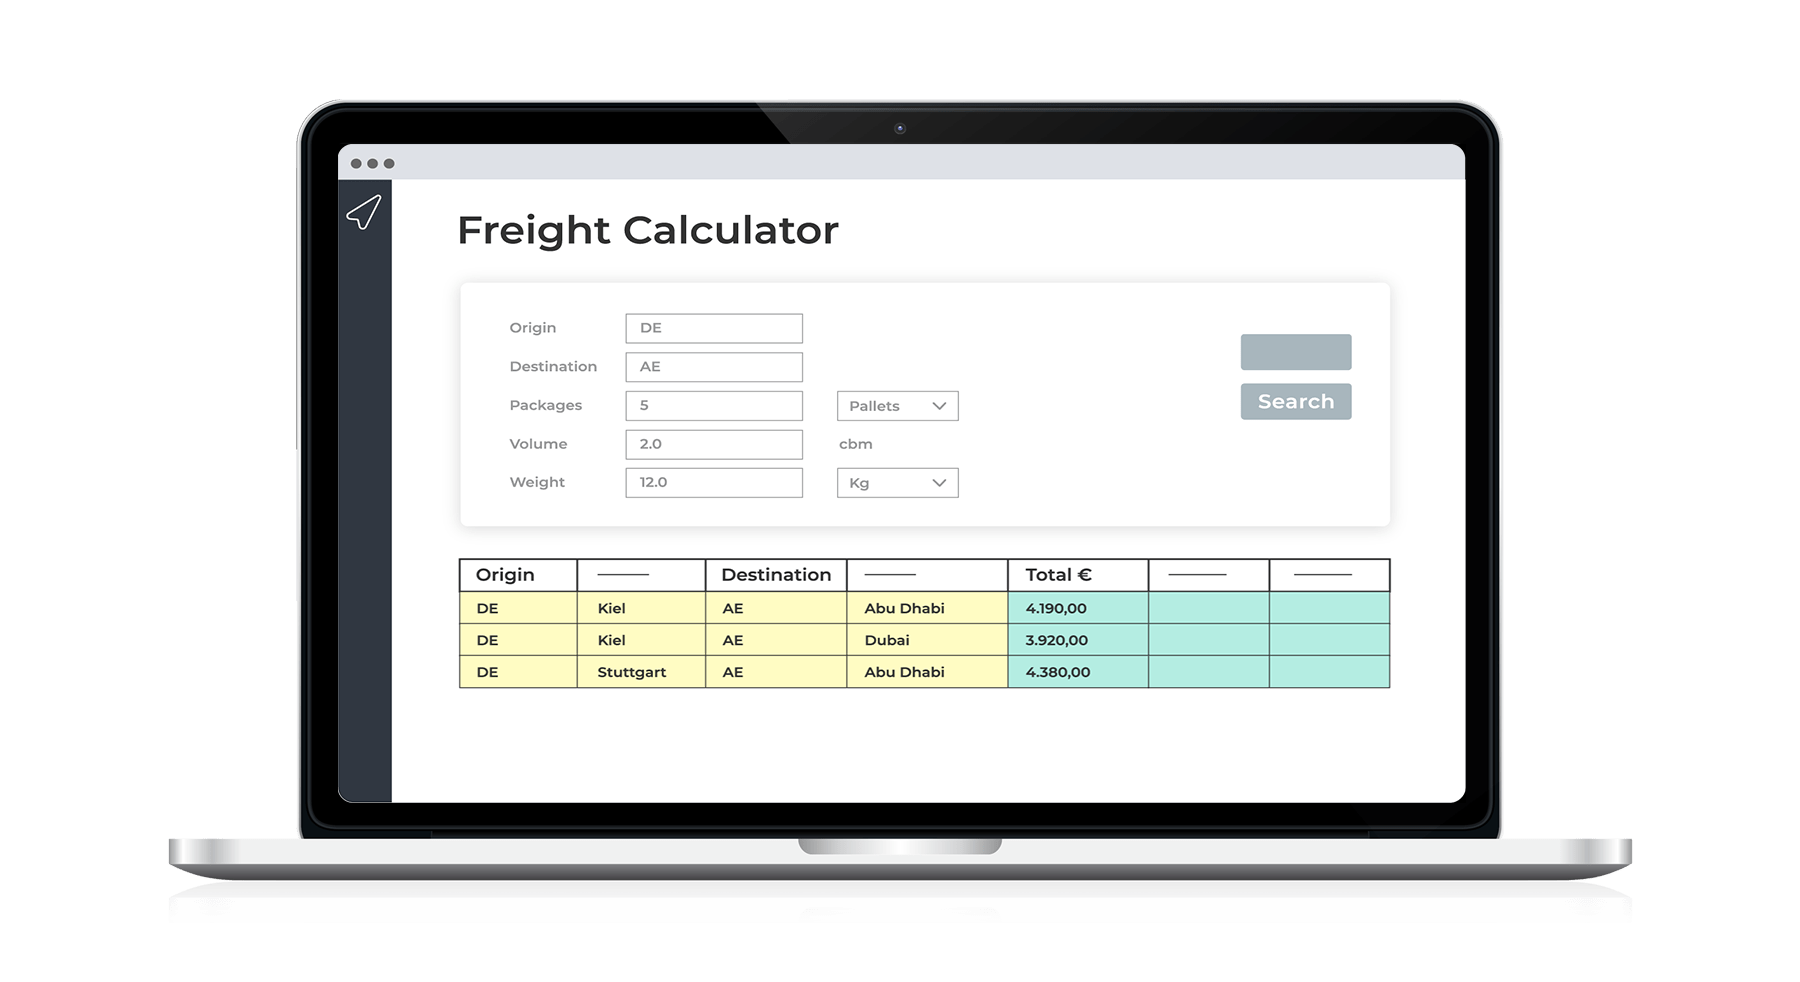 Freight Calculator